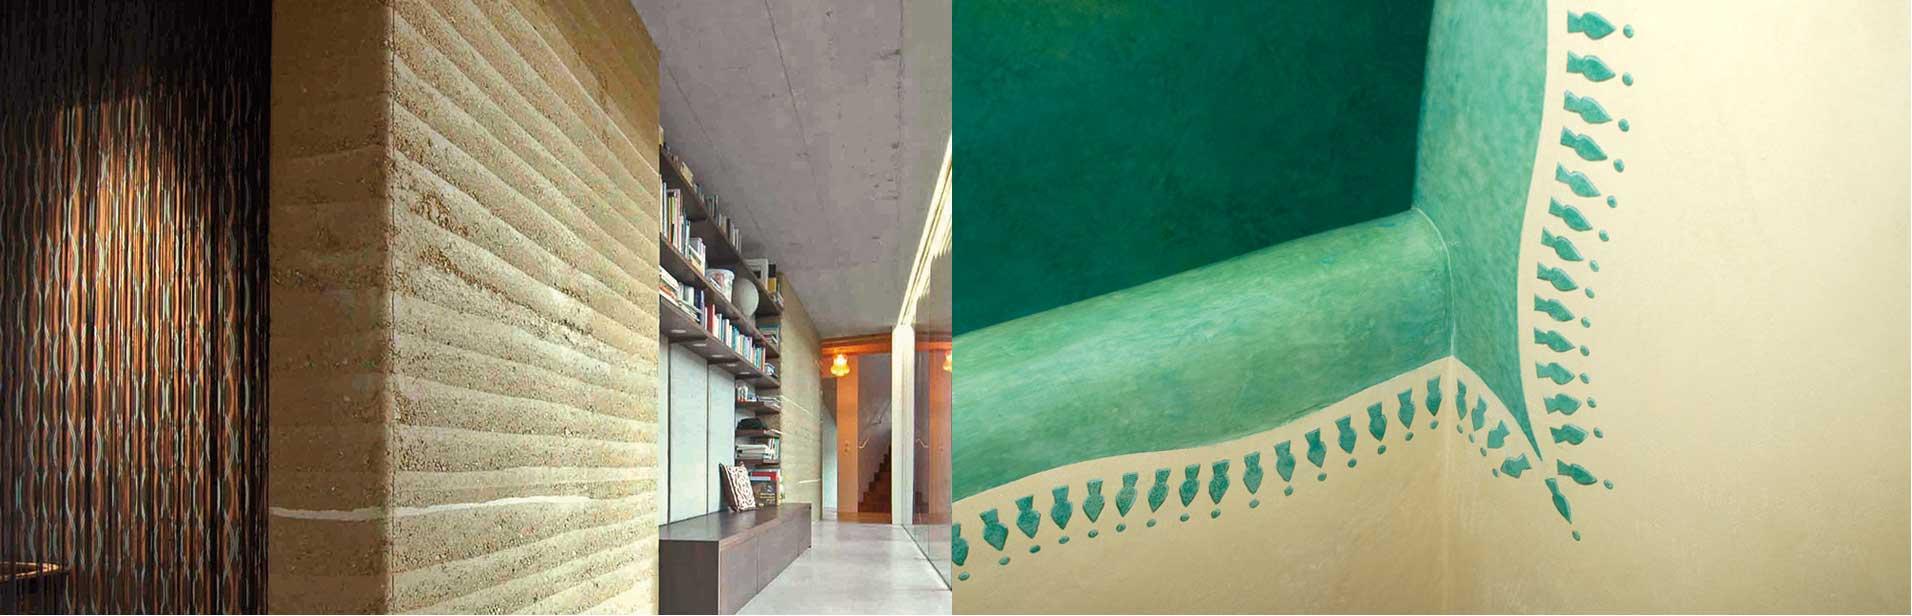 messingschlager gmbh maler und stukkateur schl sselfeld. Black Bedroom Furniture Sets. Home Design Ideas